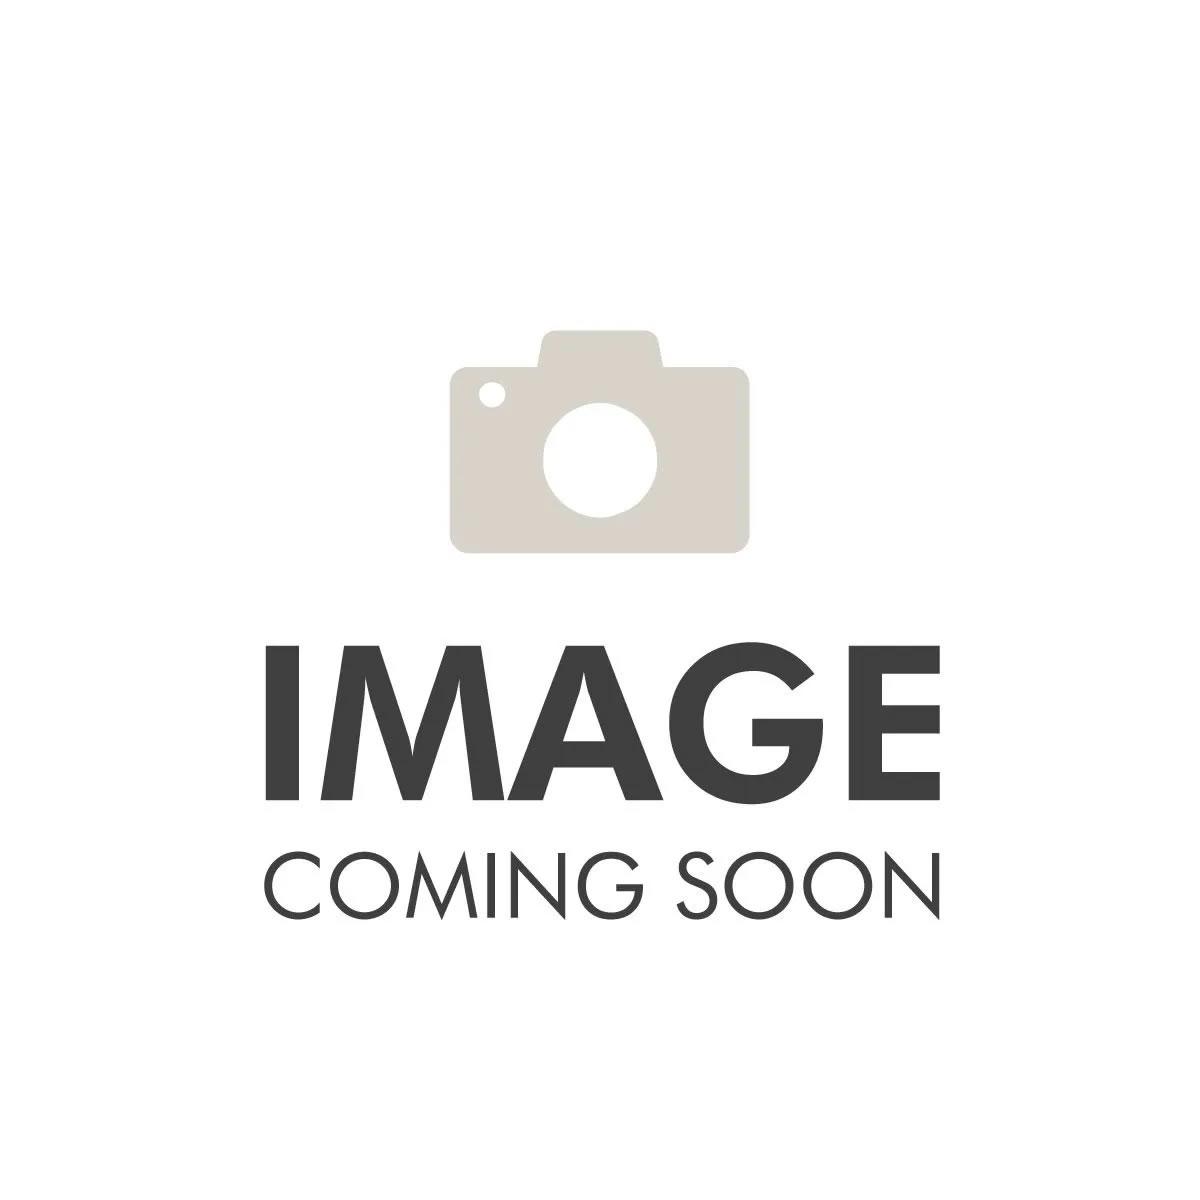 Neo Seat Protector Vests, Black, 07-18 JK/JL